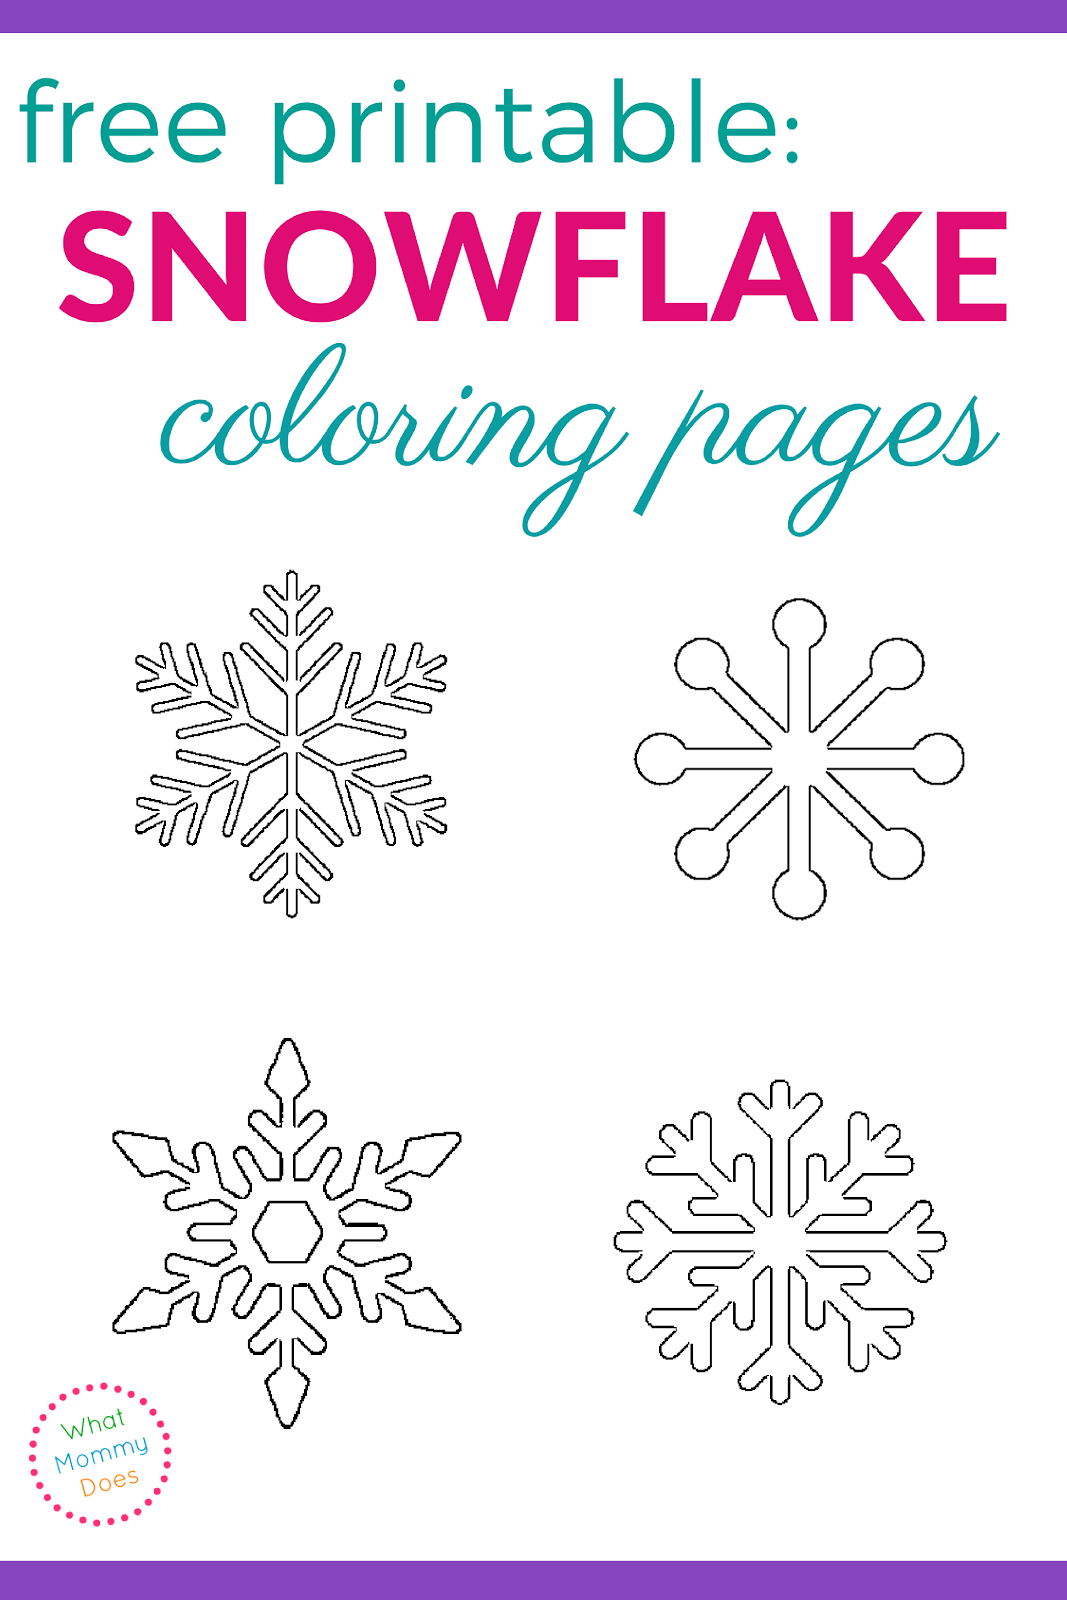 Printable Snowflake Coloring Pages Snowflake coloring